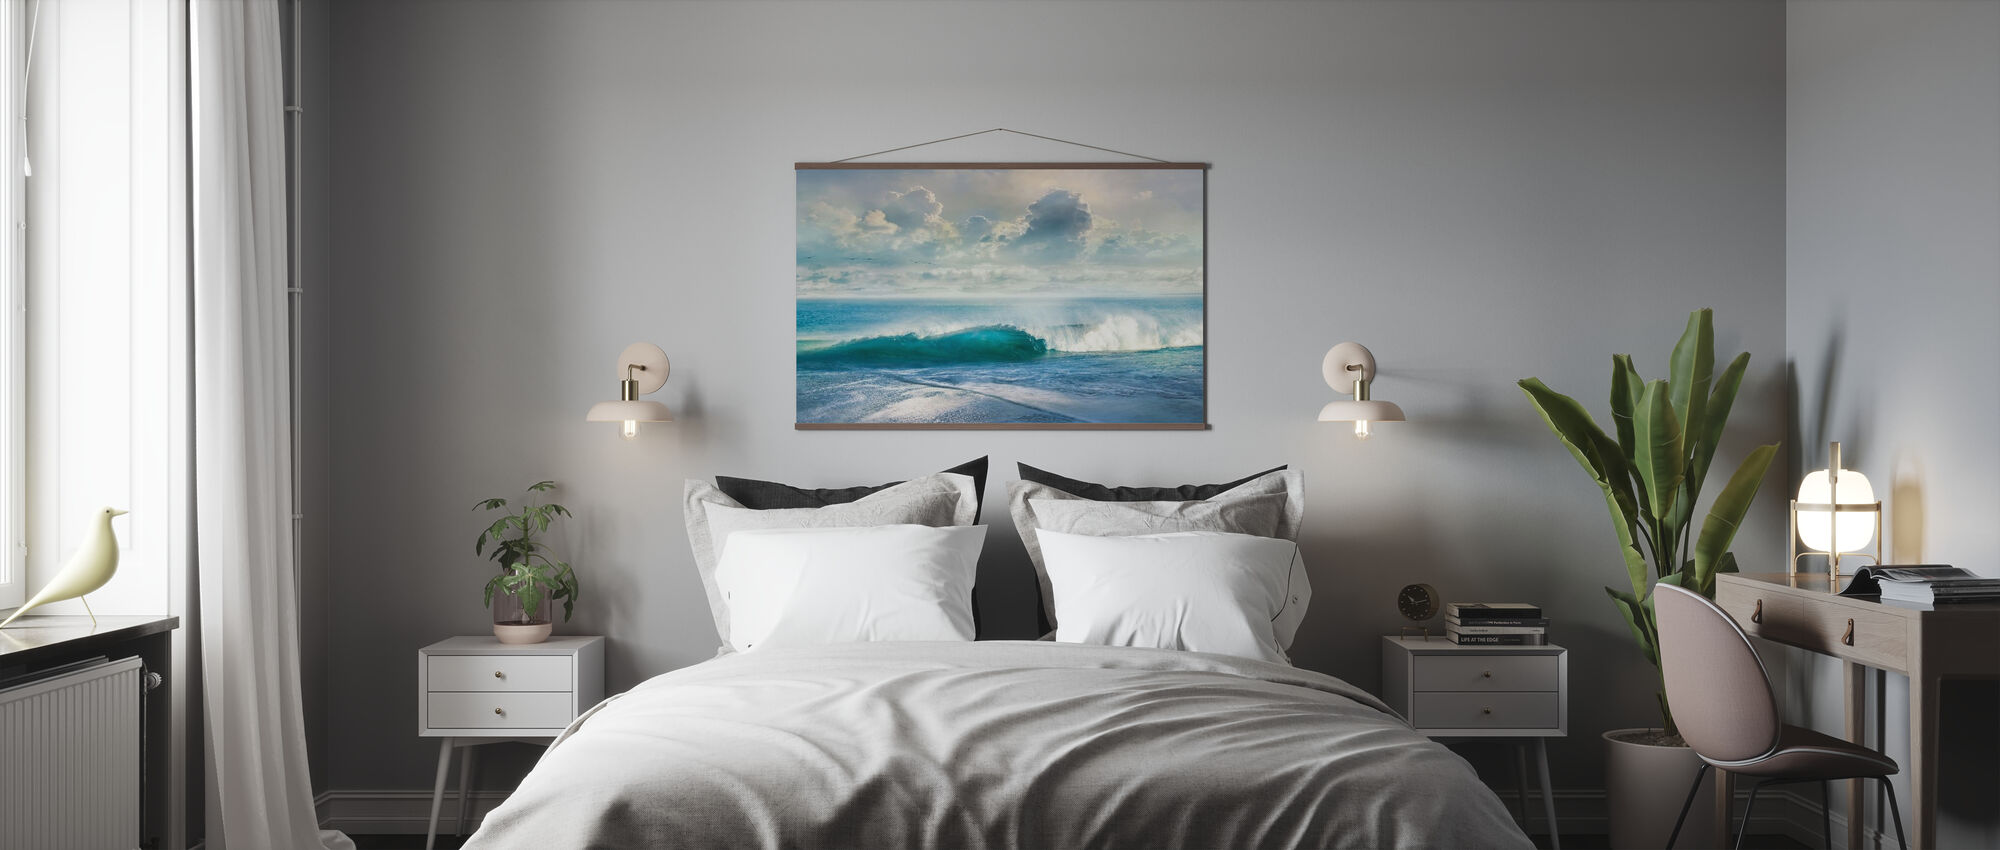 Stormy Sea - Poster - Bedroom